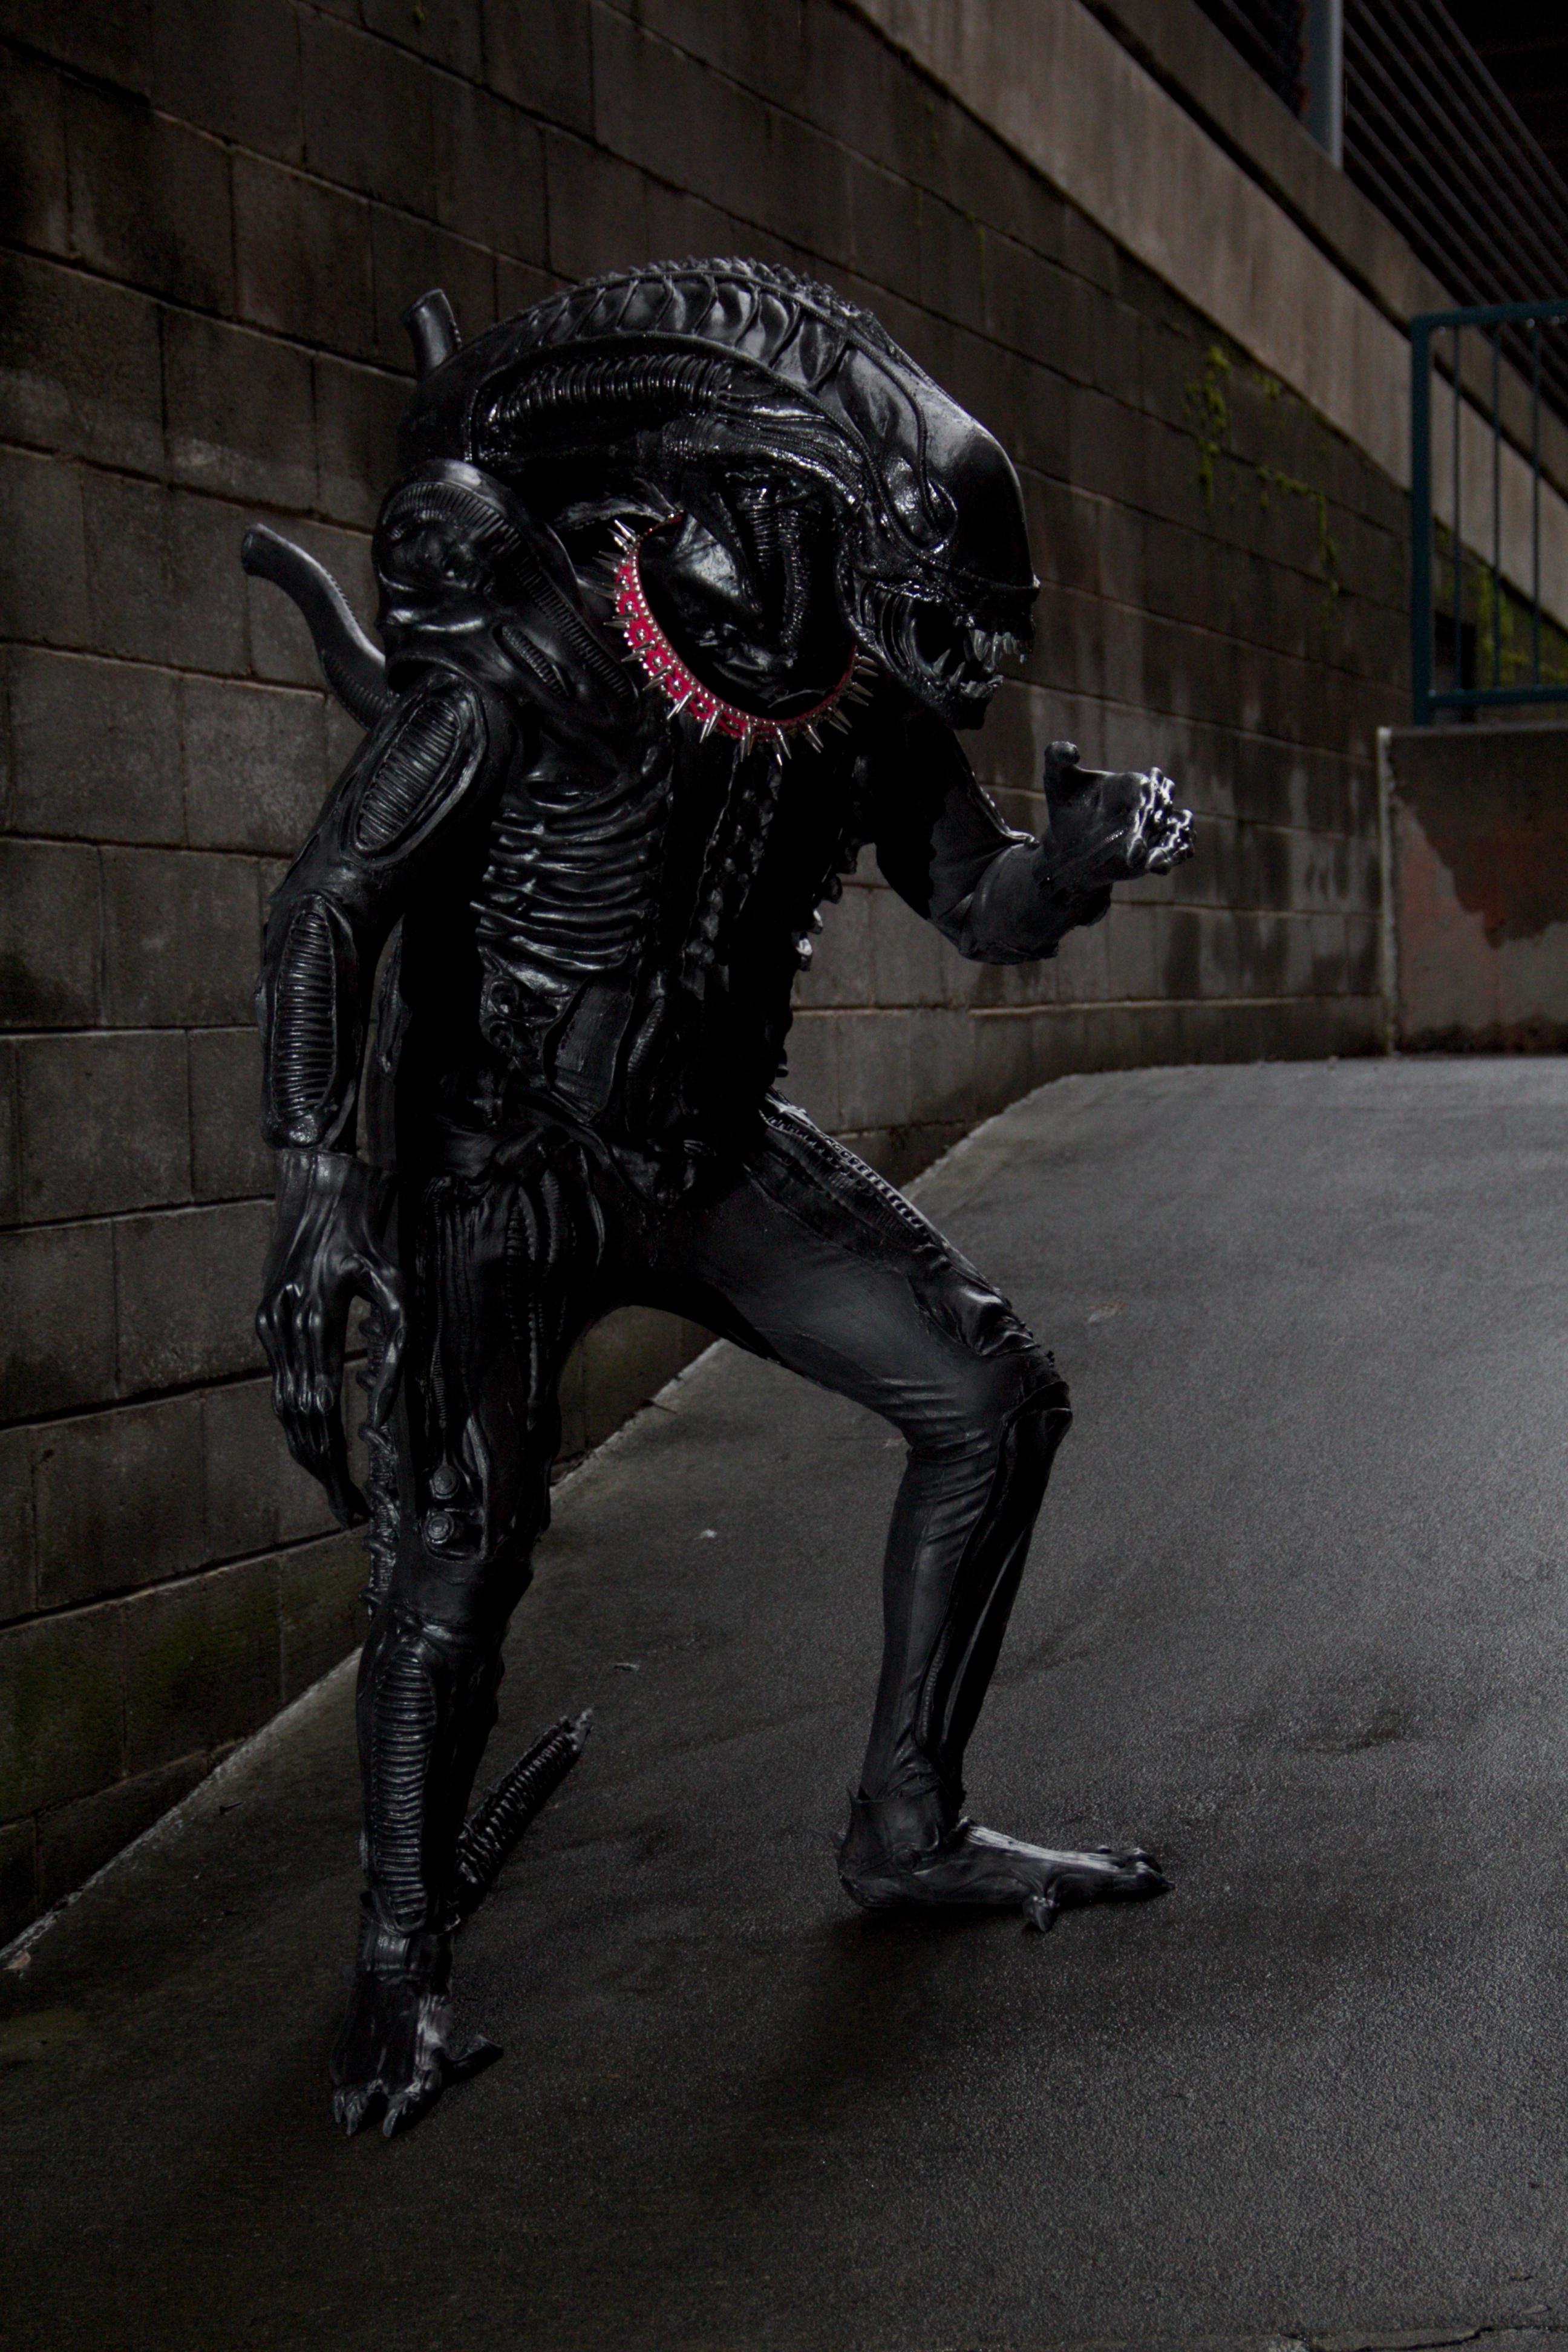 Xenomorph Dog Costume Aliens: Colonial Marin...